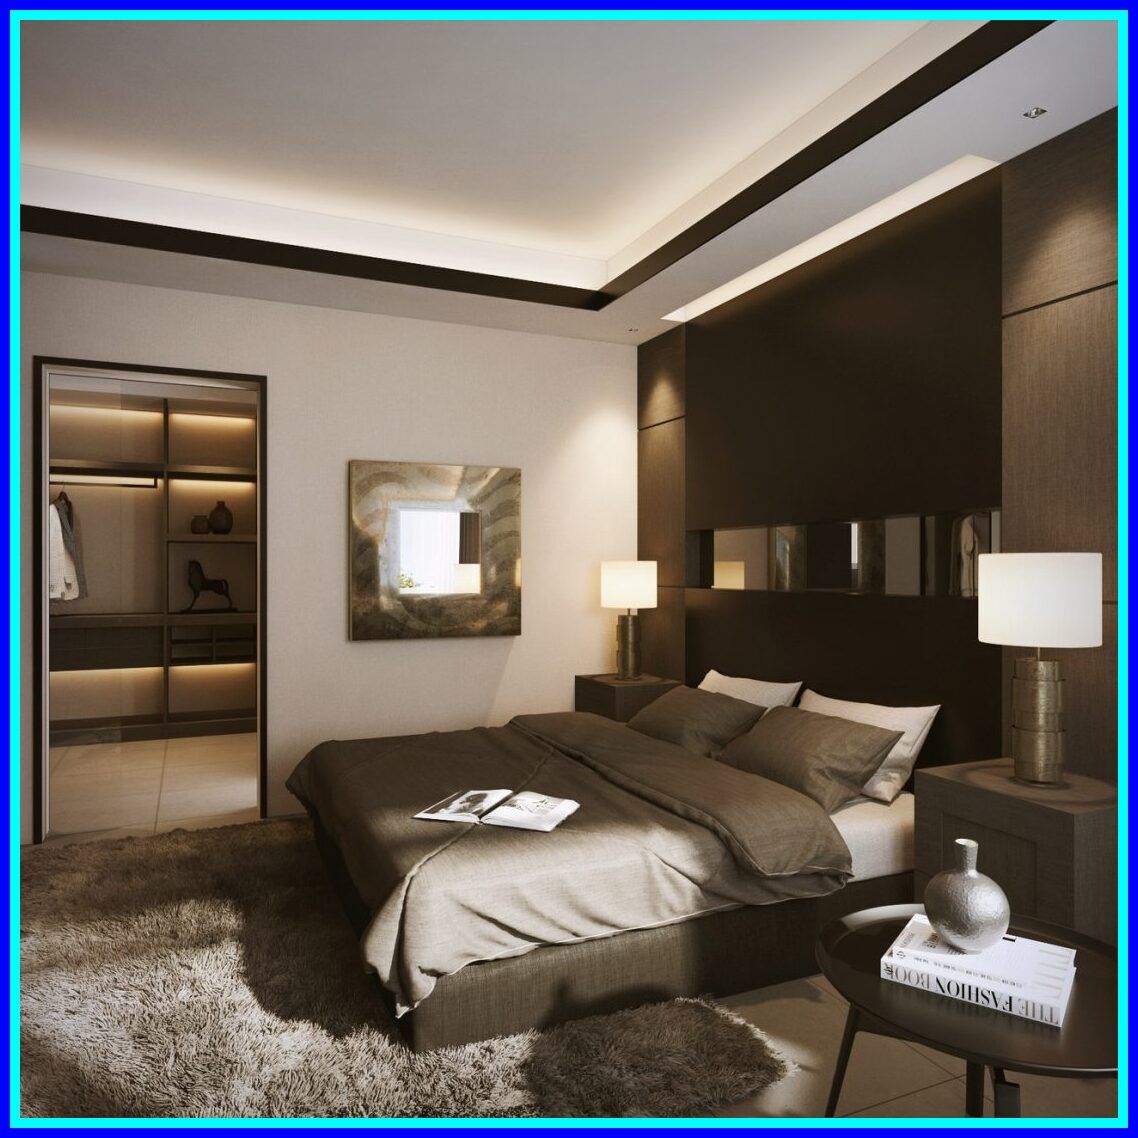 Home Design Ideas Malaysia: Master Bedroom Interior Design Malaysia-#master #bedroom